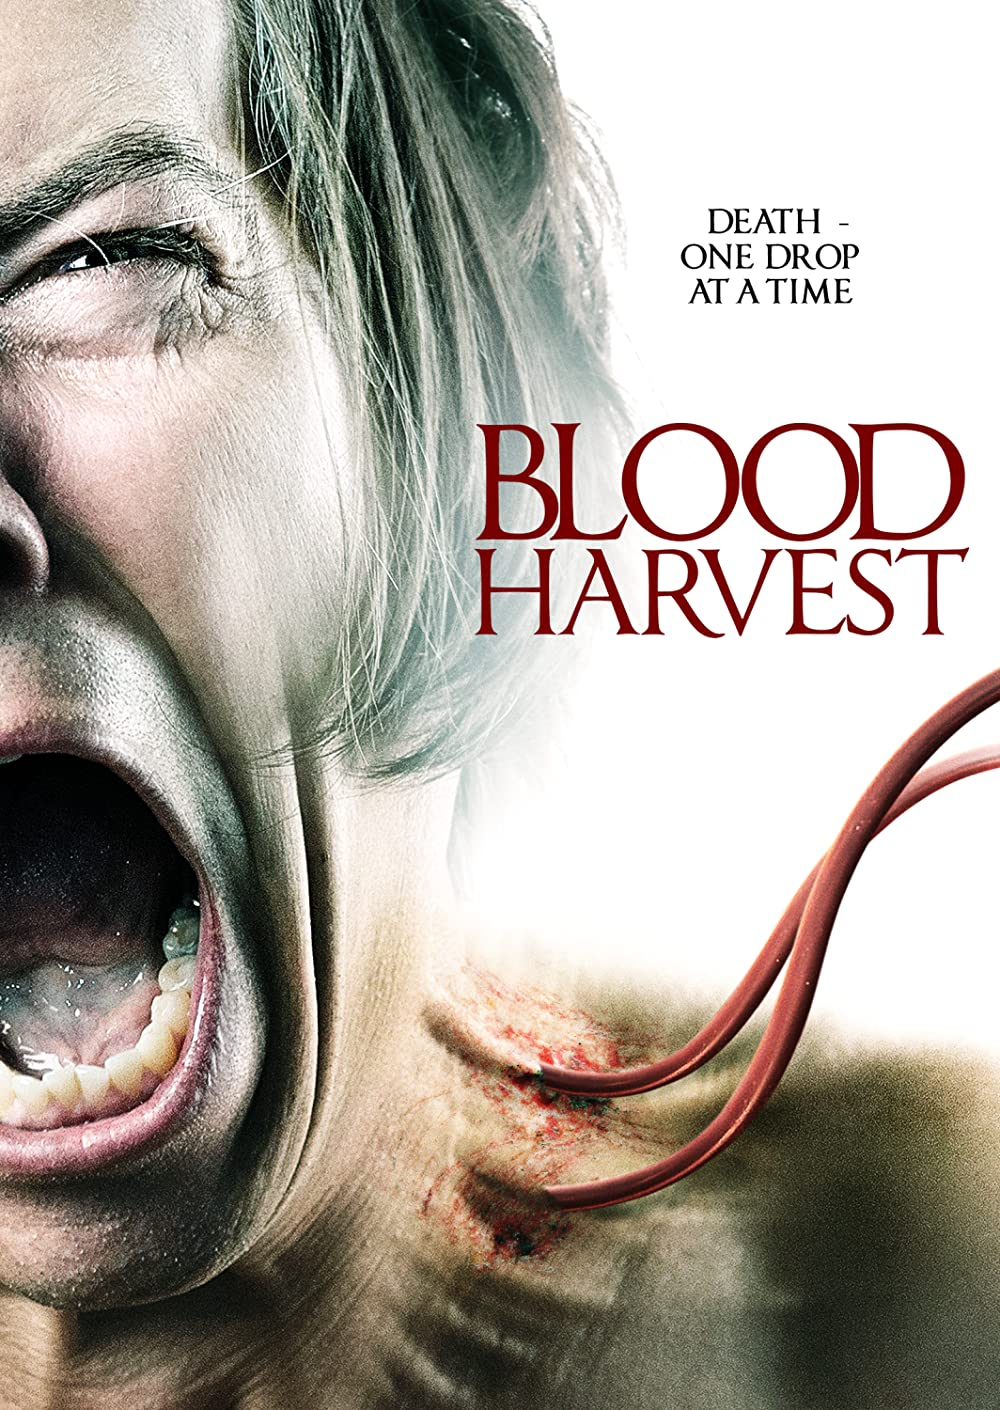 The Blood Harvest 2016